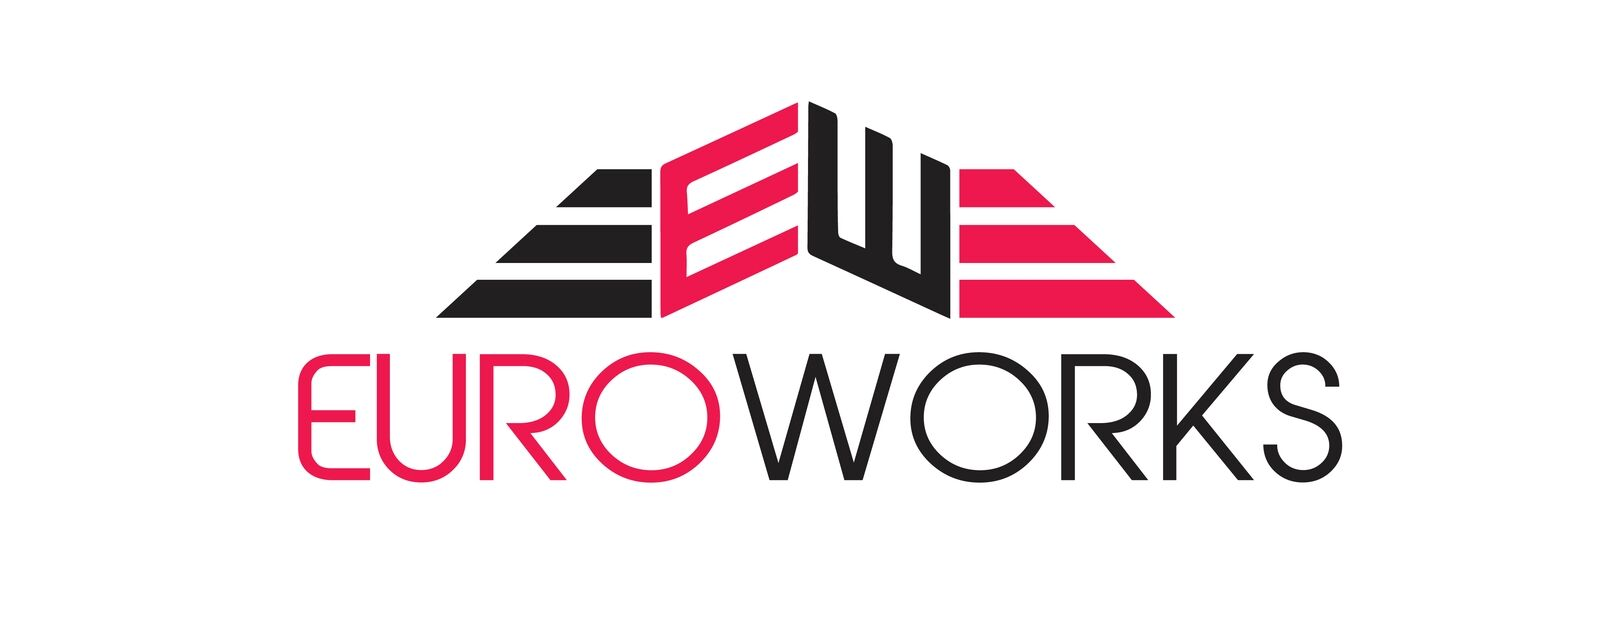 Euroworks